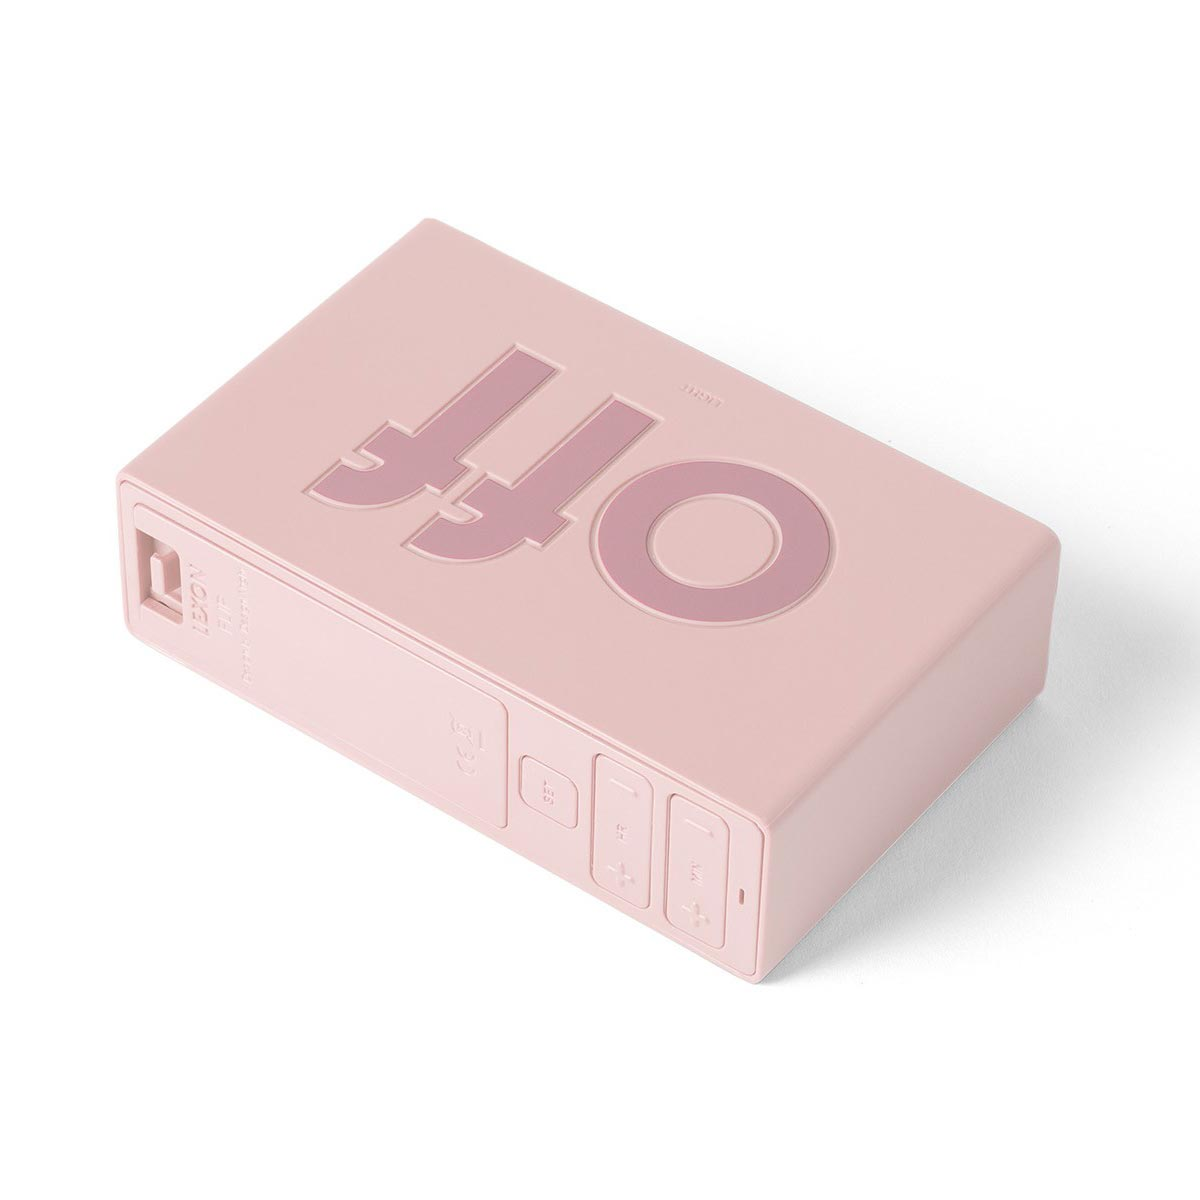 LEXON Flip LCD alarm clock LR150P9 pink | the design gift shop